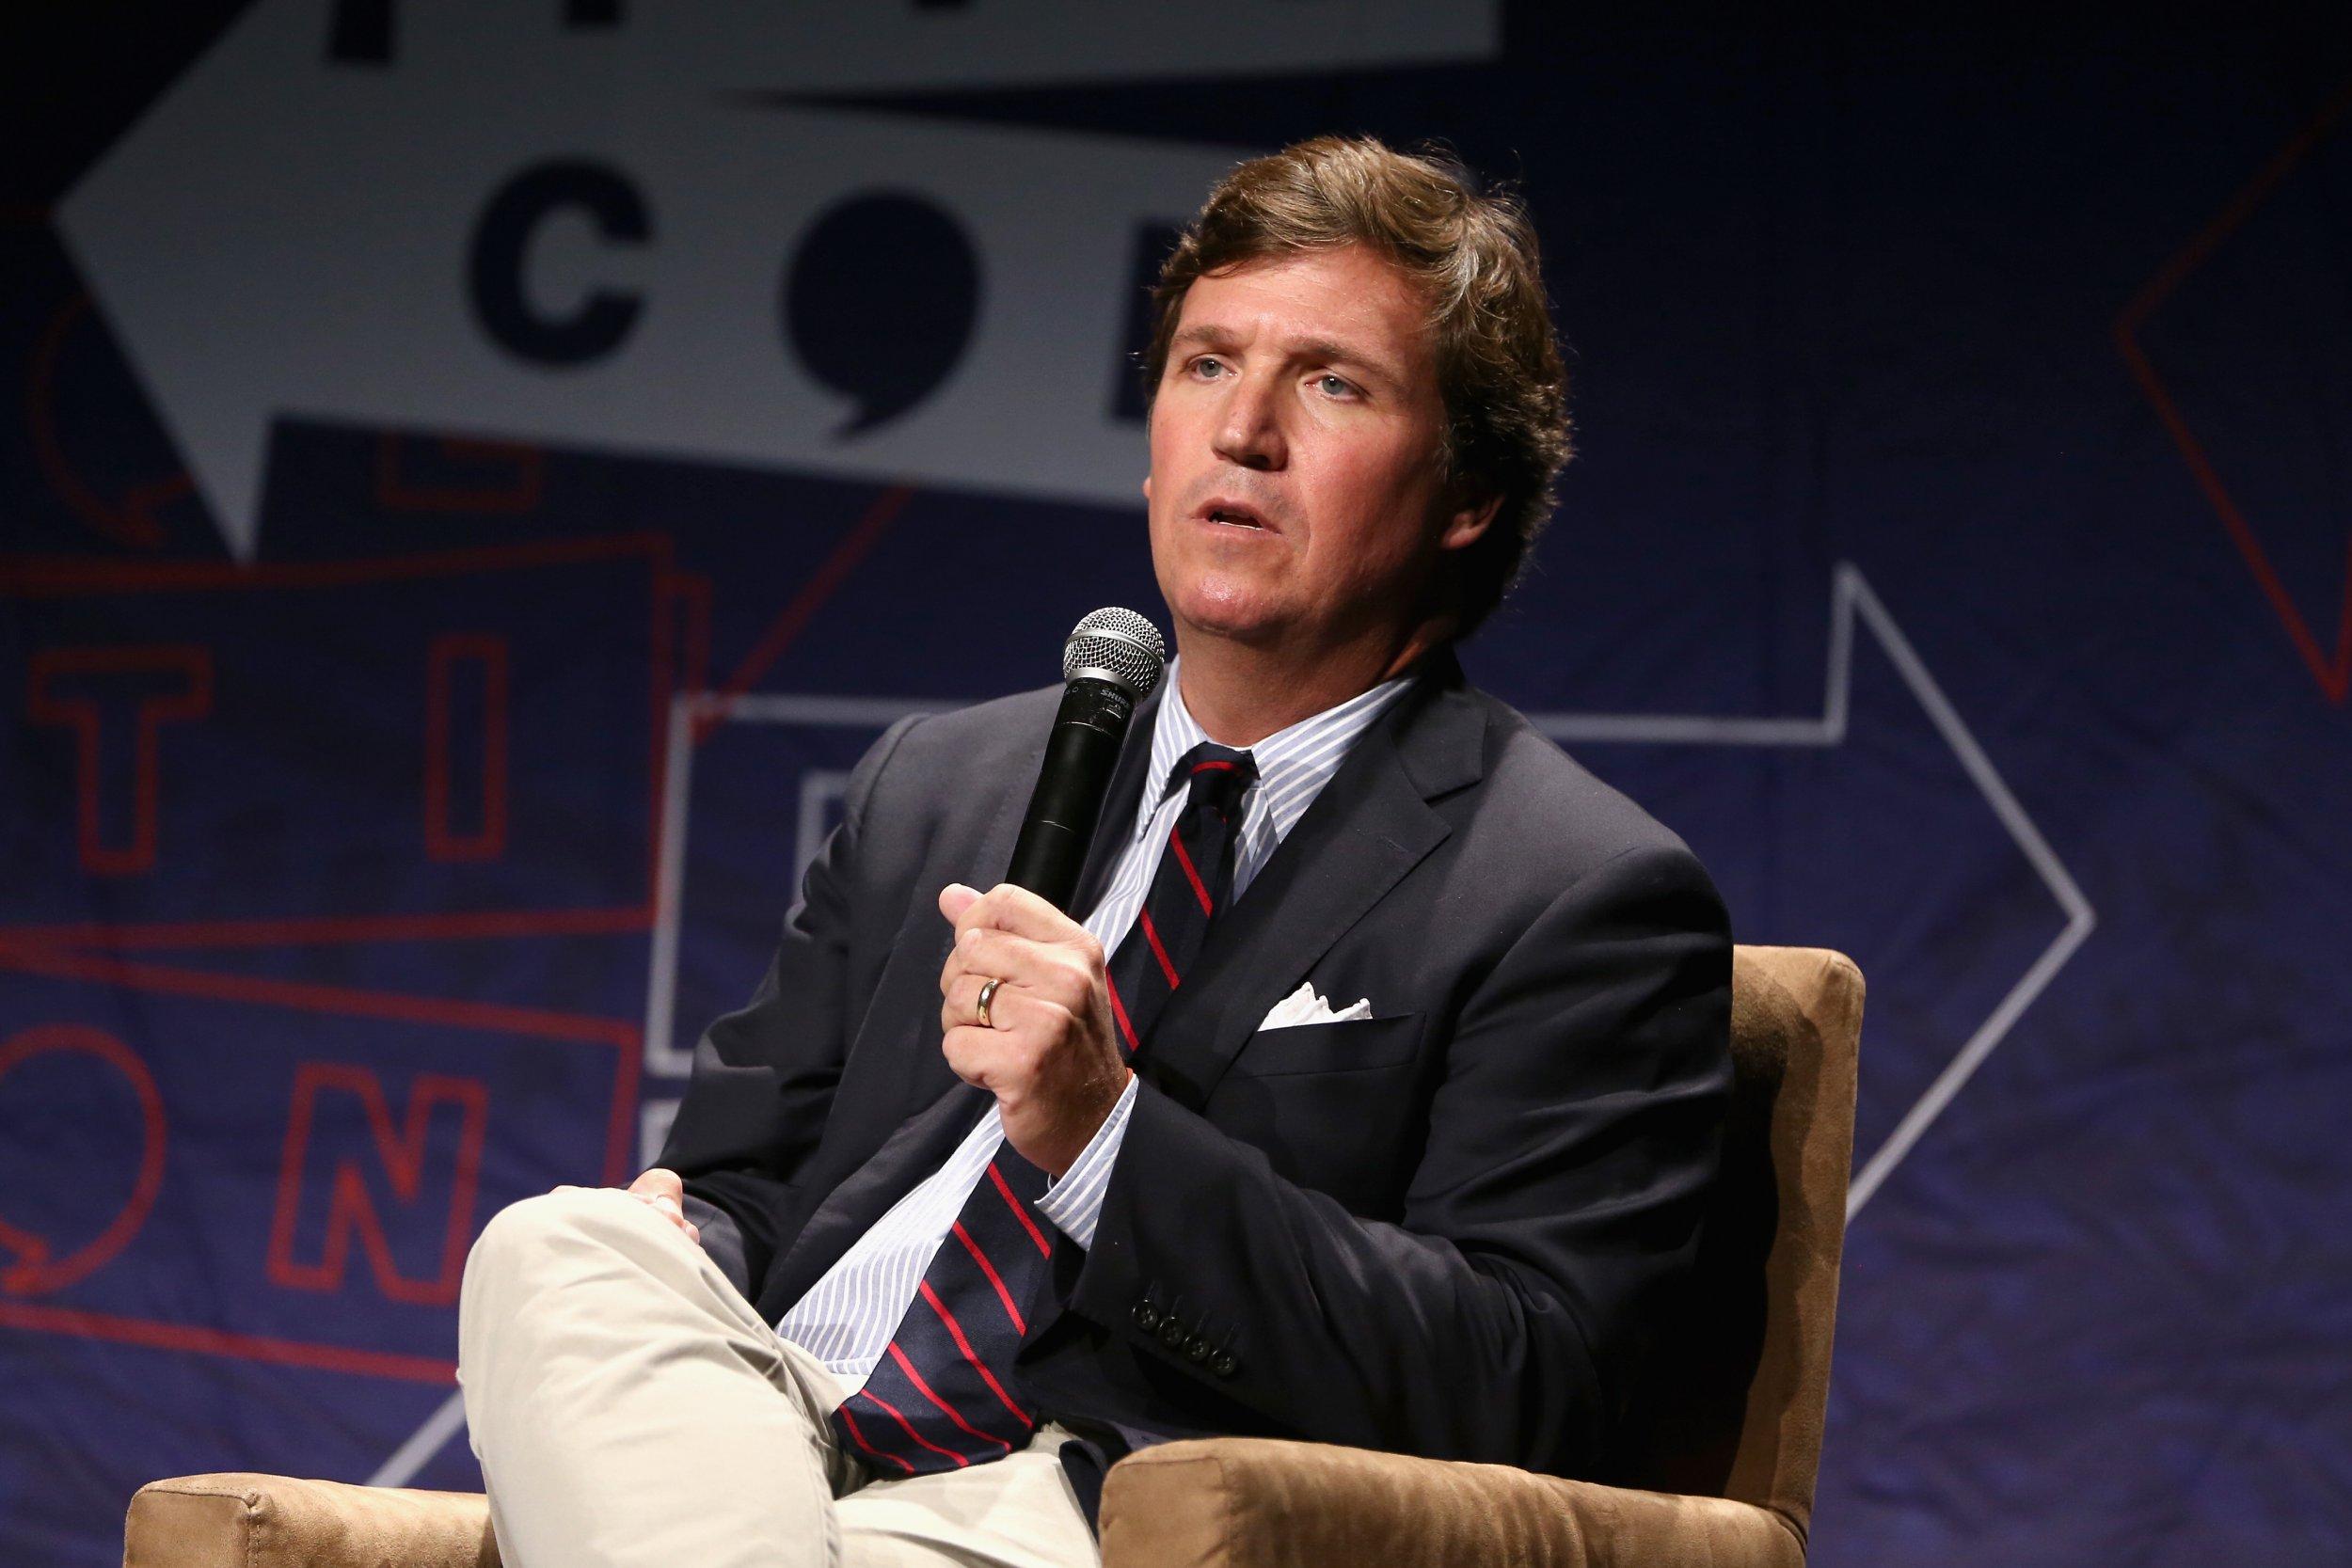 Tucker Carlson, Fox News, Stephen Colbert, Racist, Immigration, Gingerbread Men